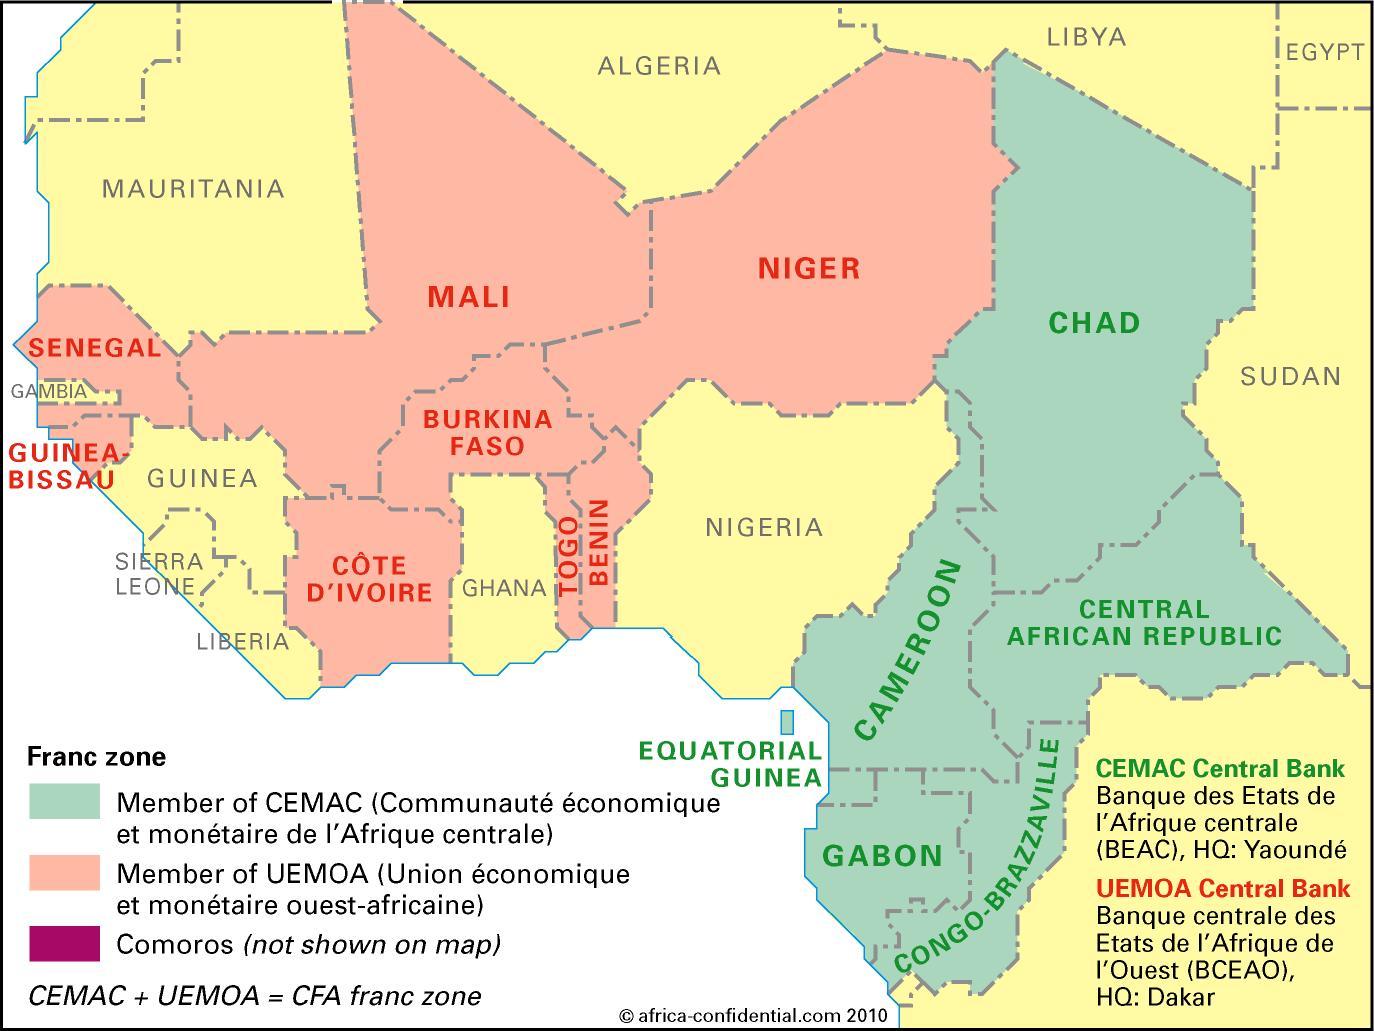 economically enslaved the francophone